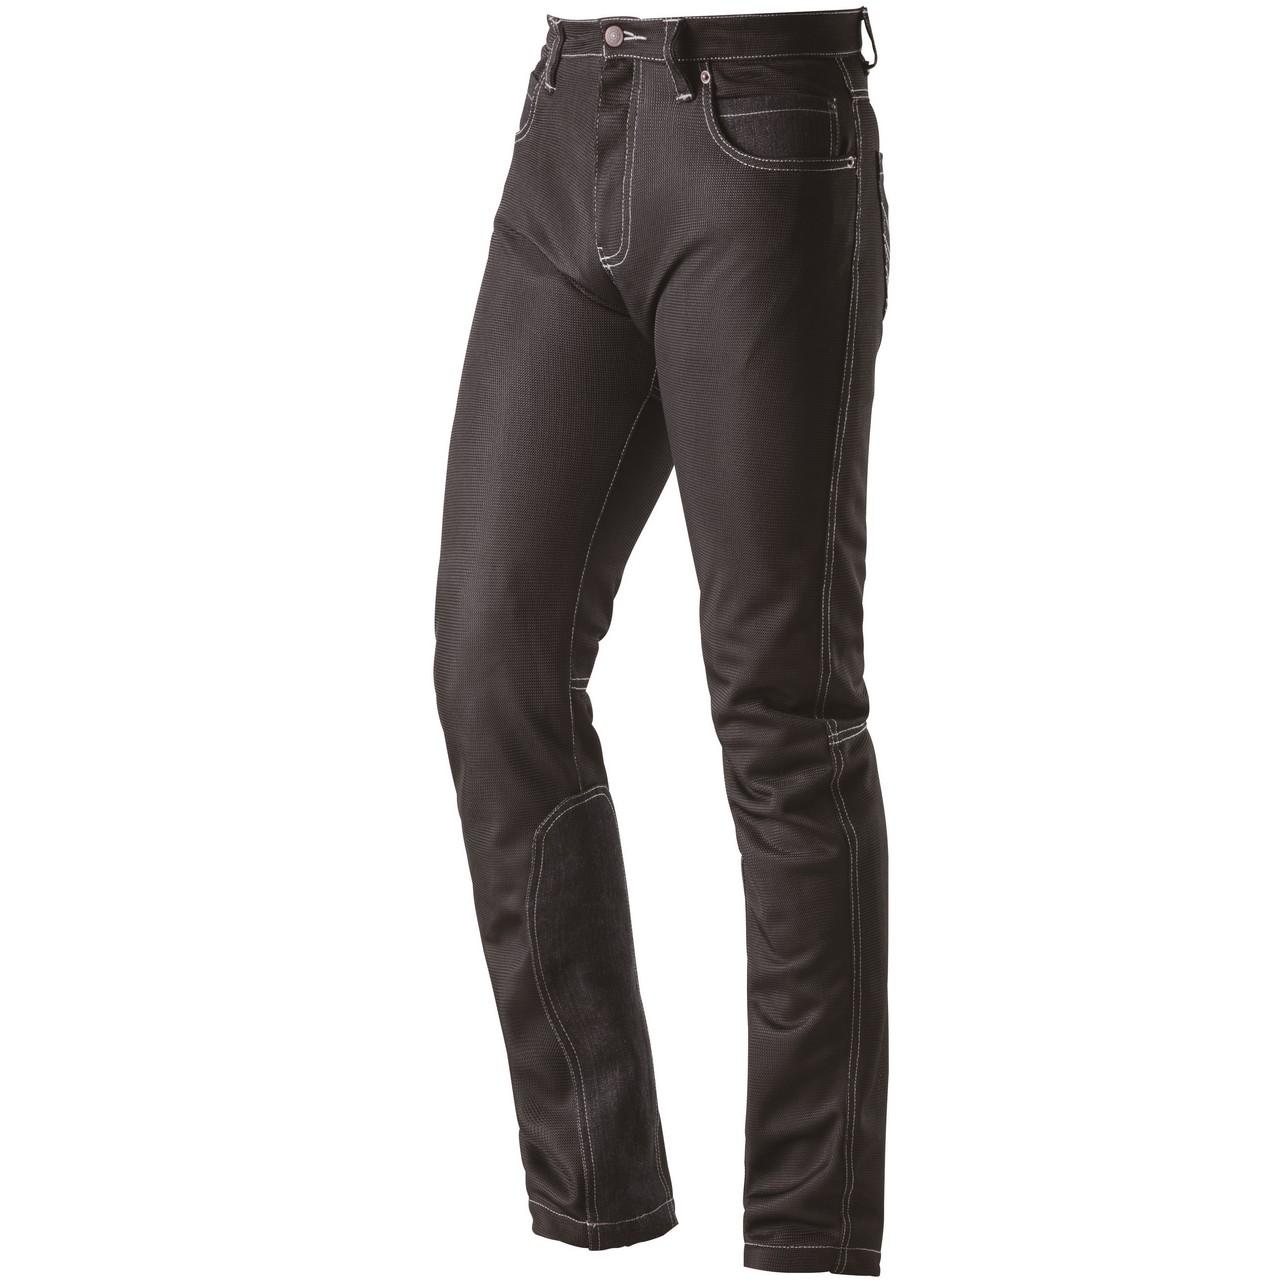 Mesh Denim Style Pants